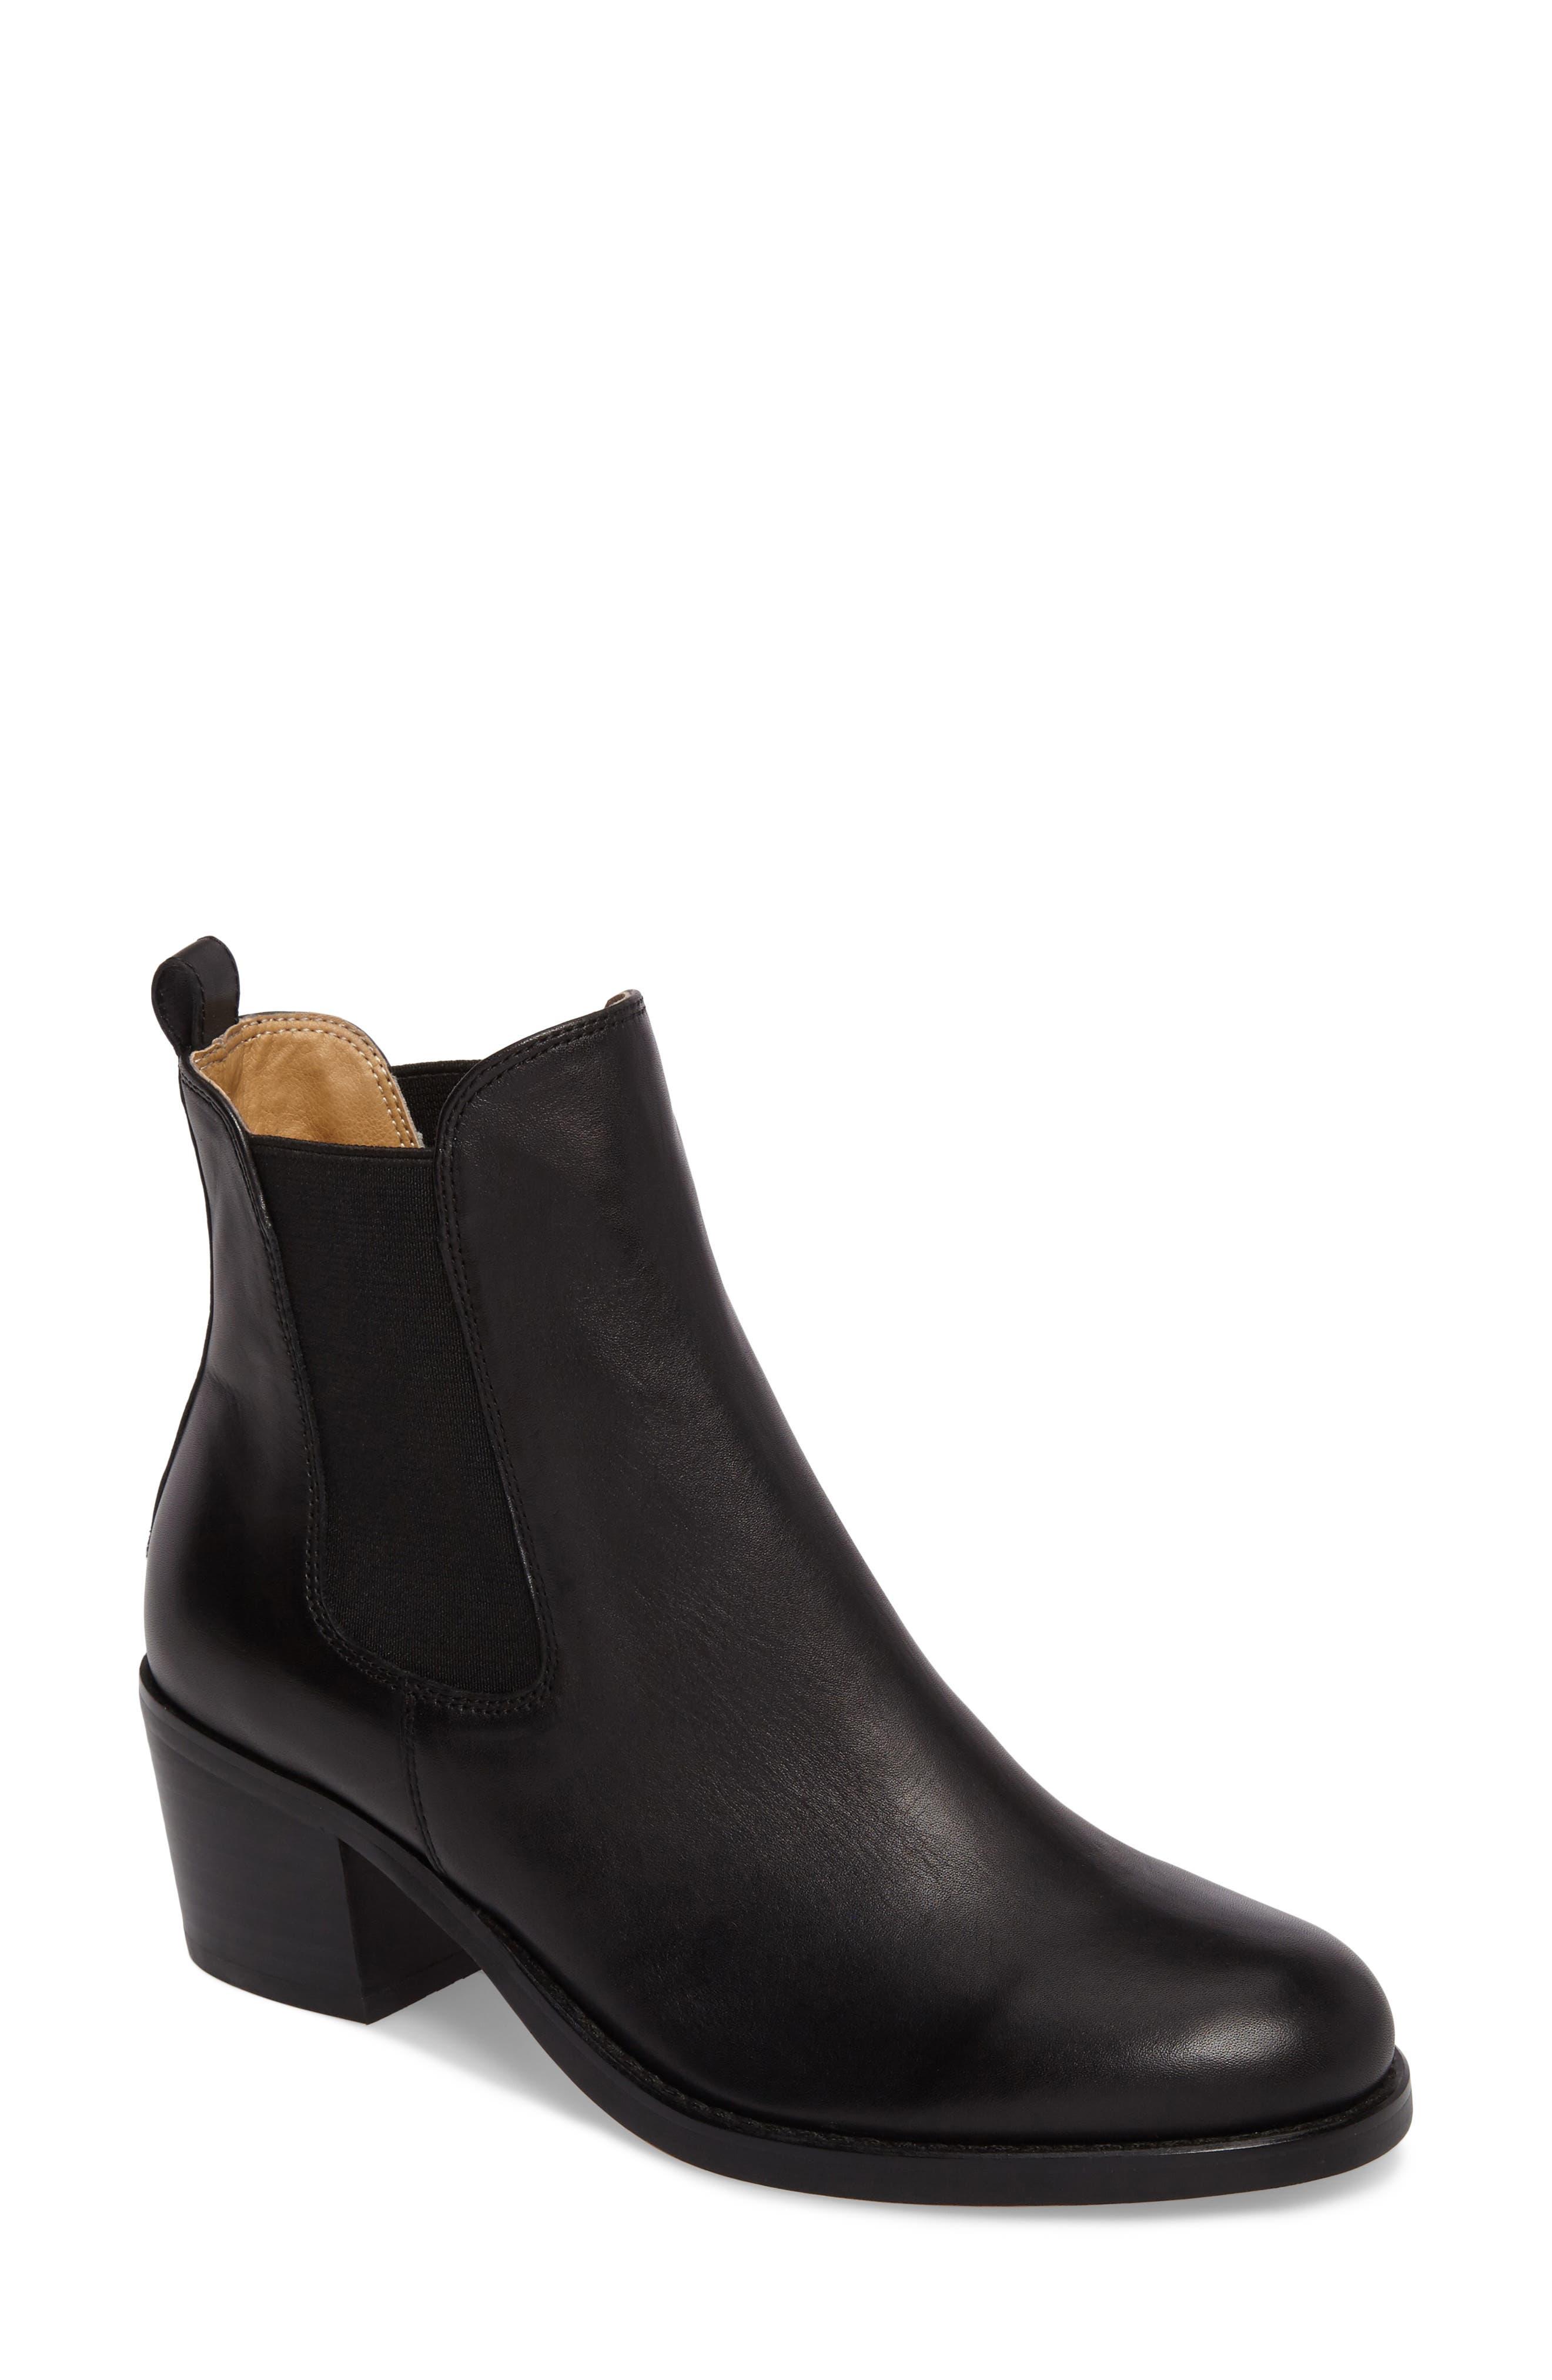 Joshua Block Heel Bootie,                             Main thumbnail 1, color,                             Black Albany Leather